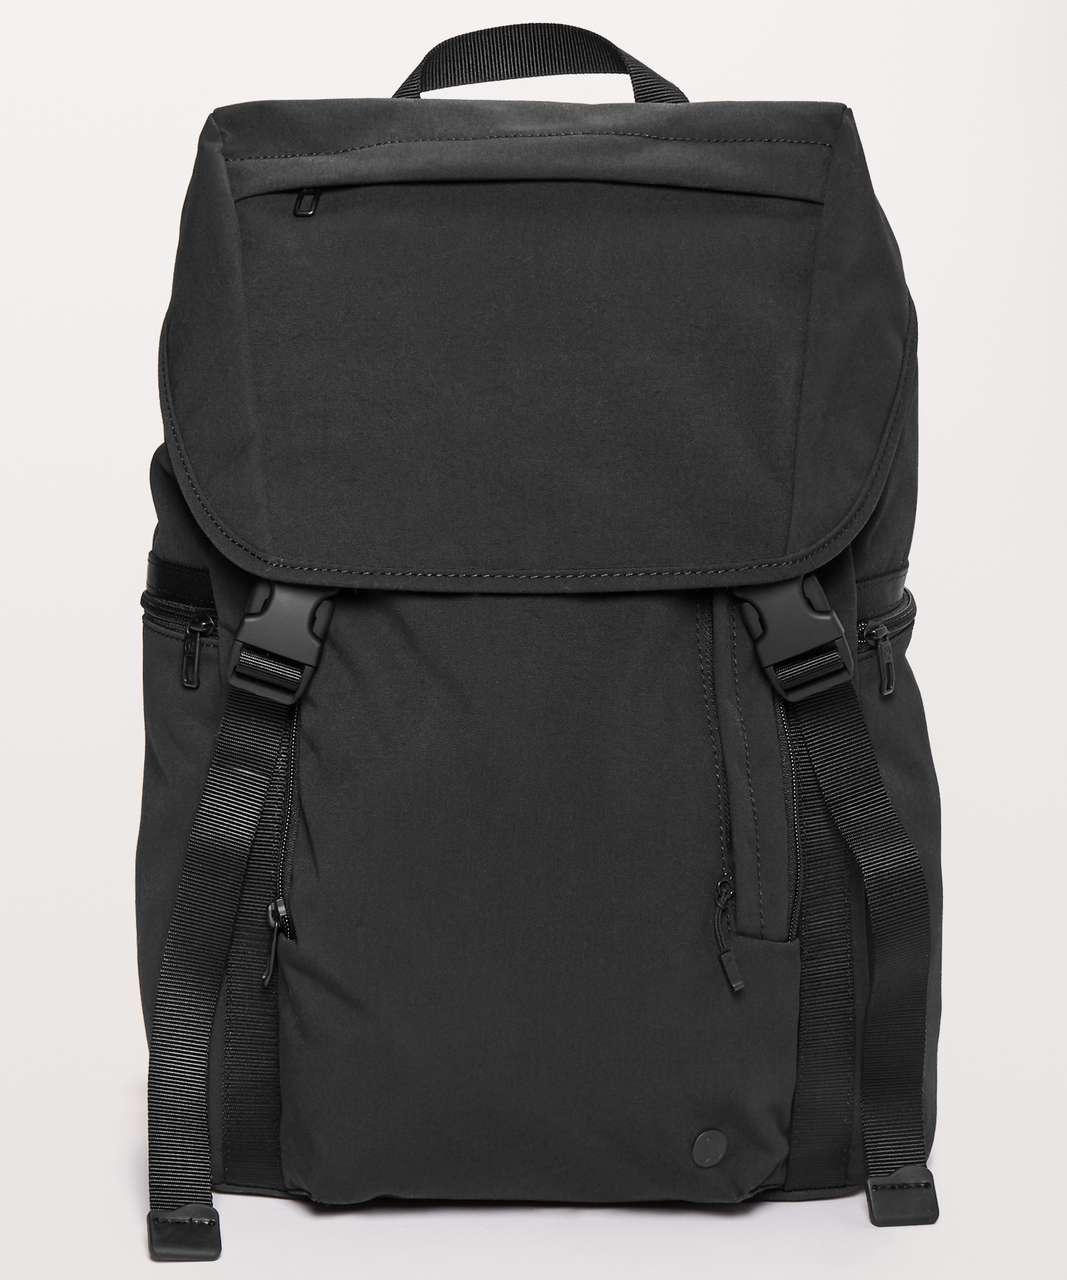 fcac4dfdc07 Lululemon Command The Day Backpack *24L - Black - lulu fanatics